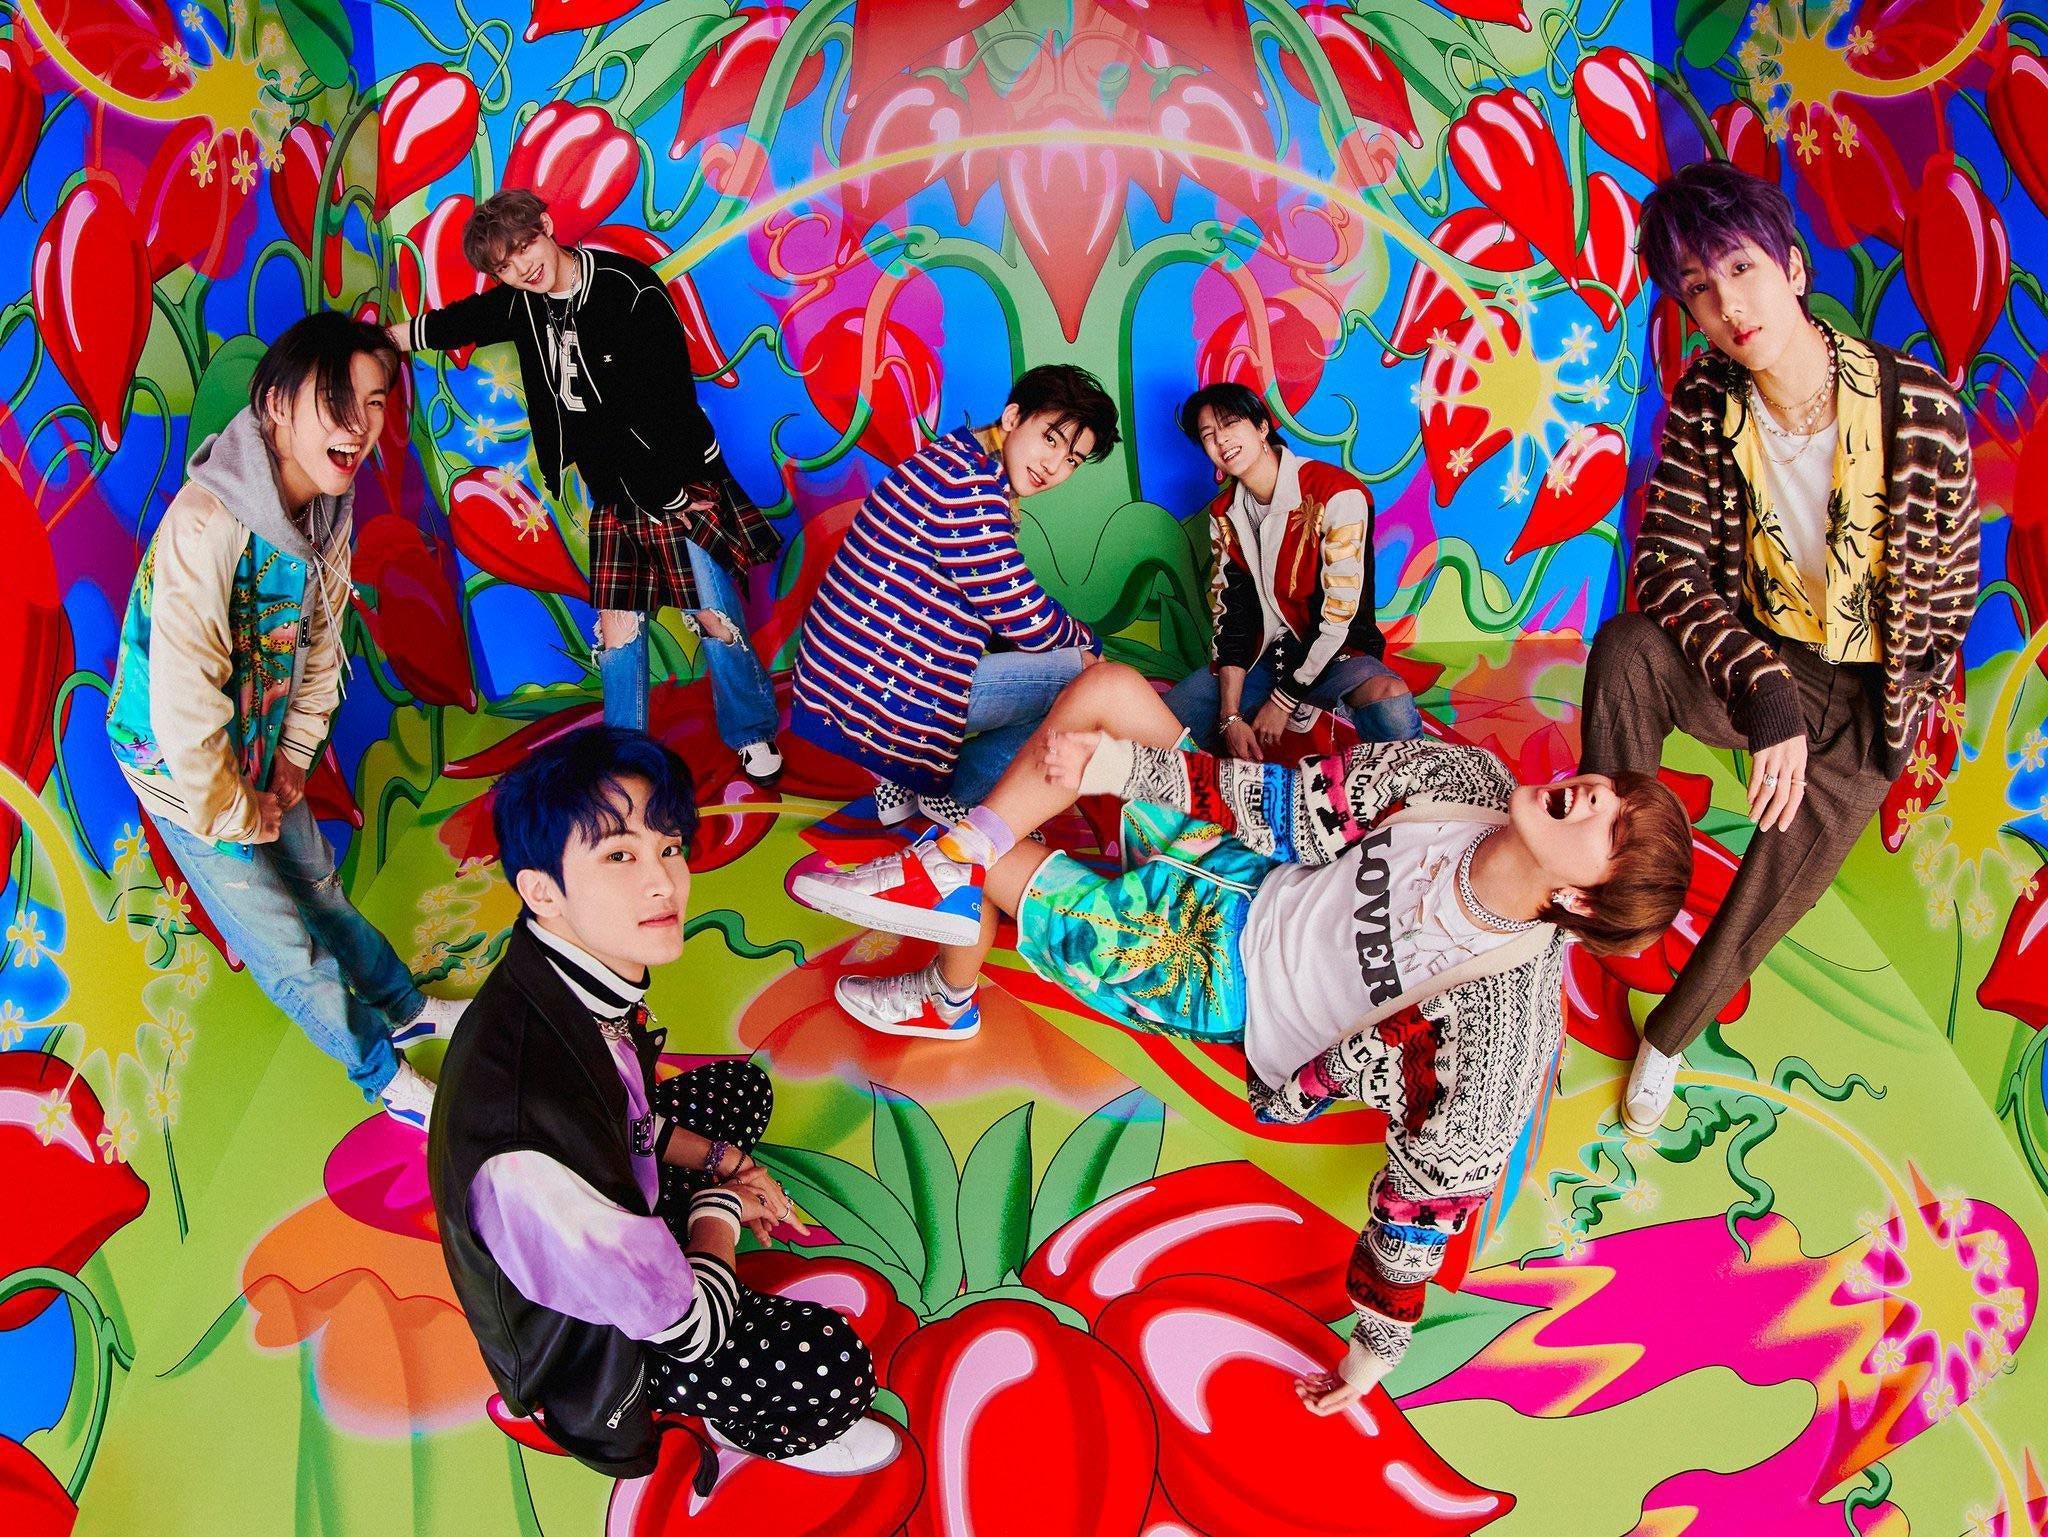 NCT Dream unveils fun group concept photos for their upcoming album 'Hot Sauce' | allkpop